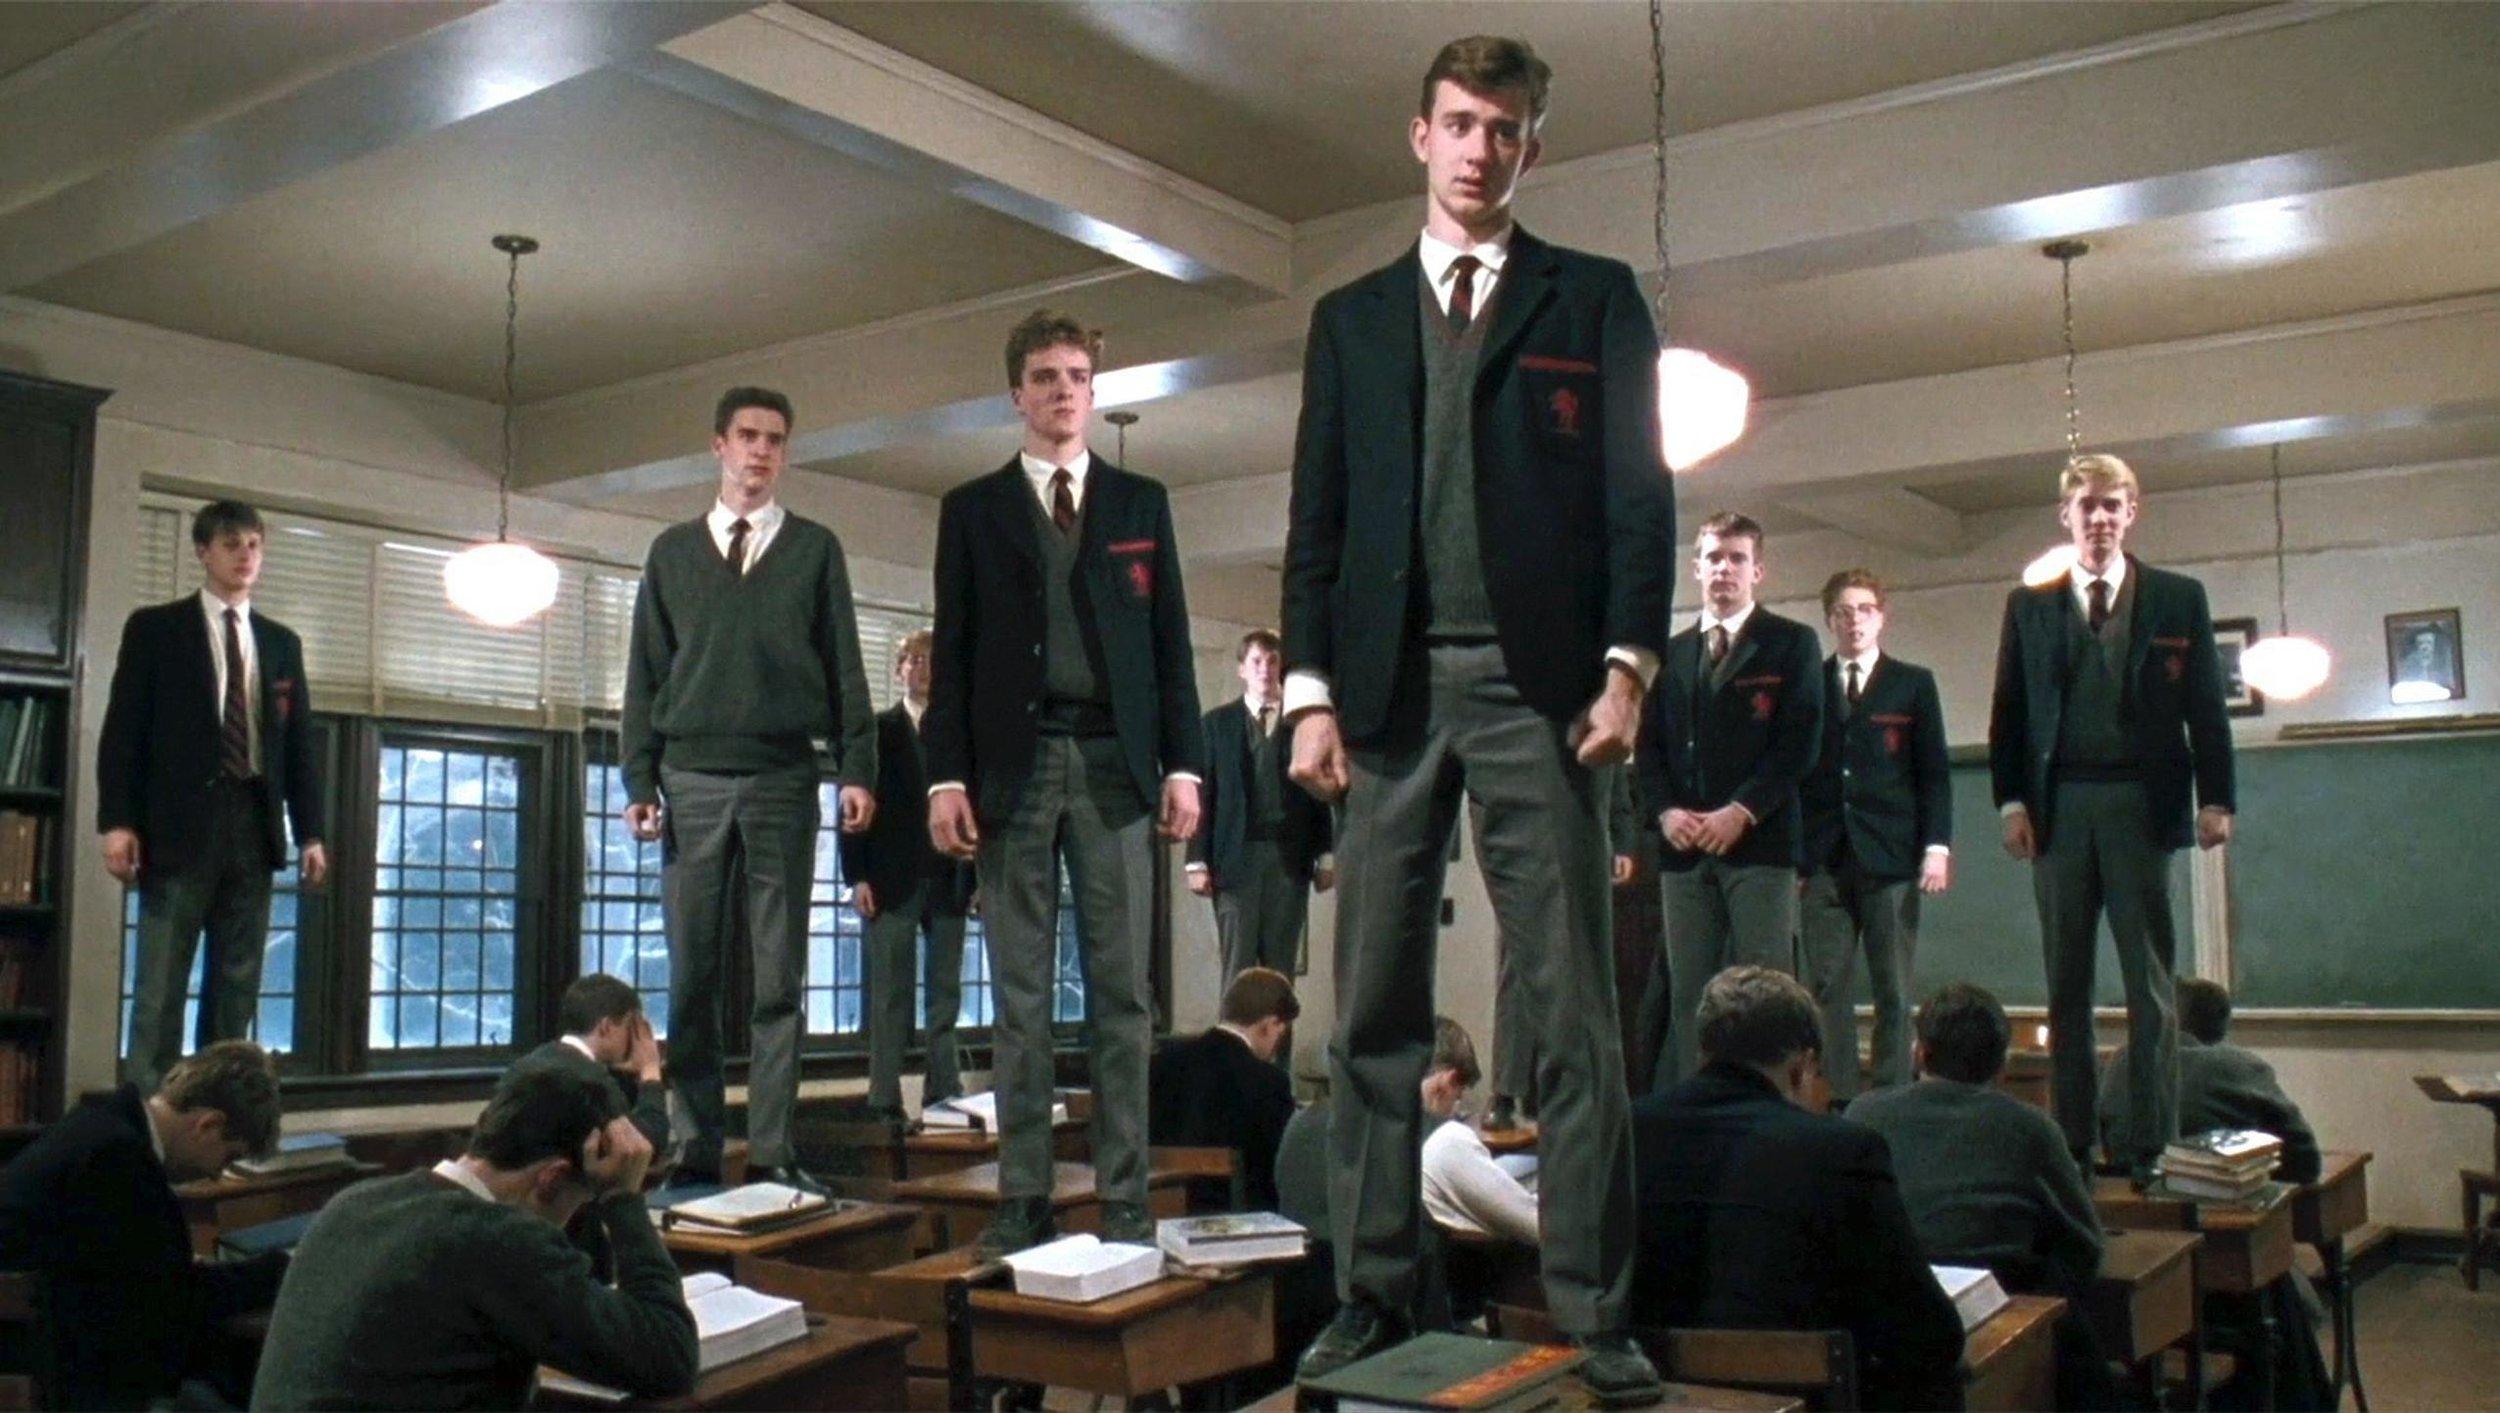 Le Cercle des Poètes Disparus   (1989) avec Robin Williams, Ethan Hawke, Robert Sean Leonard …